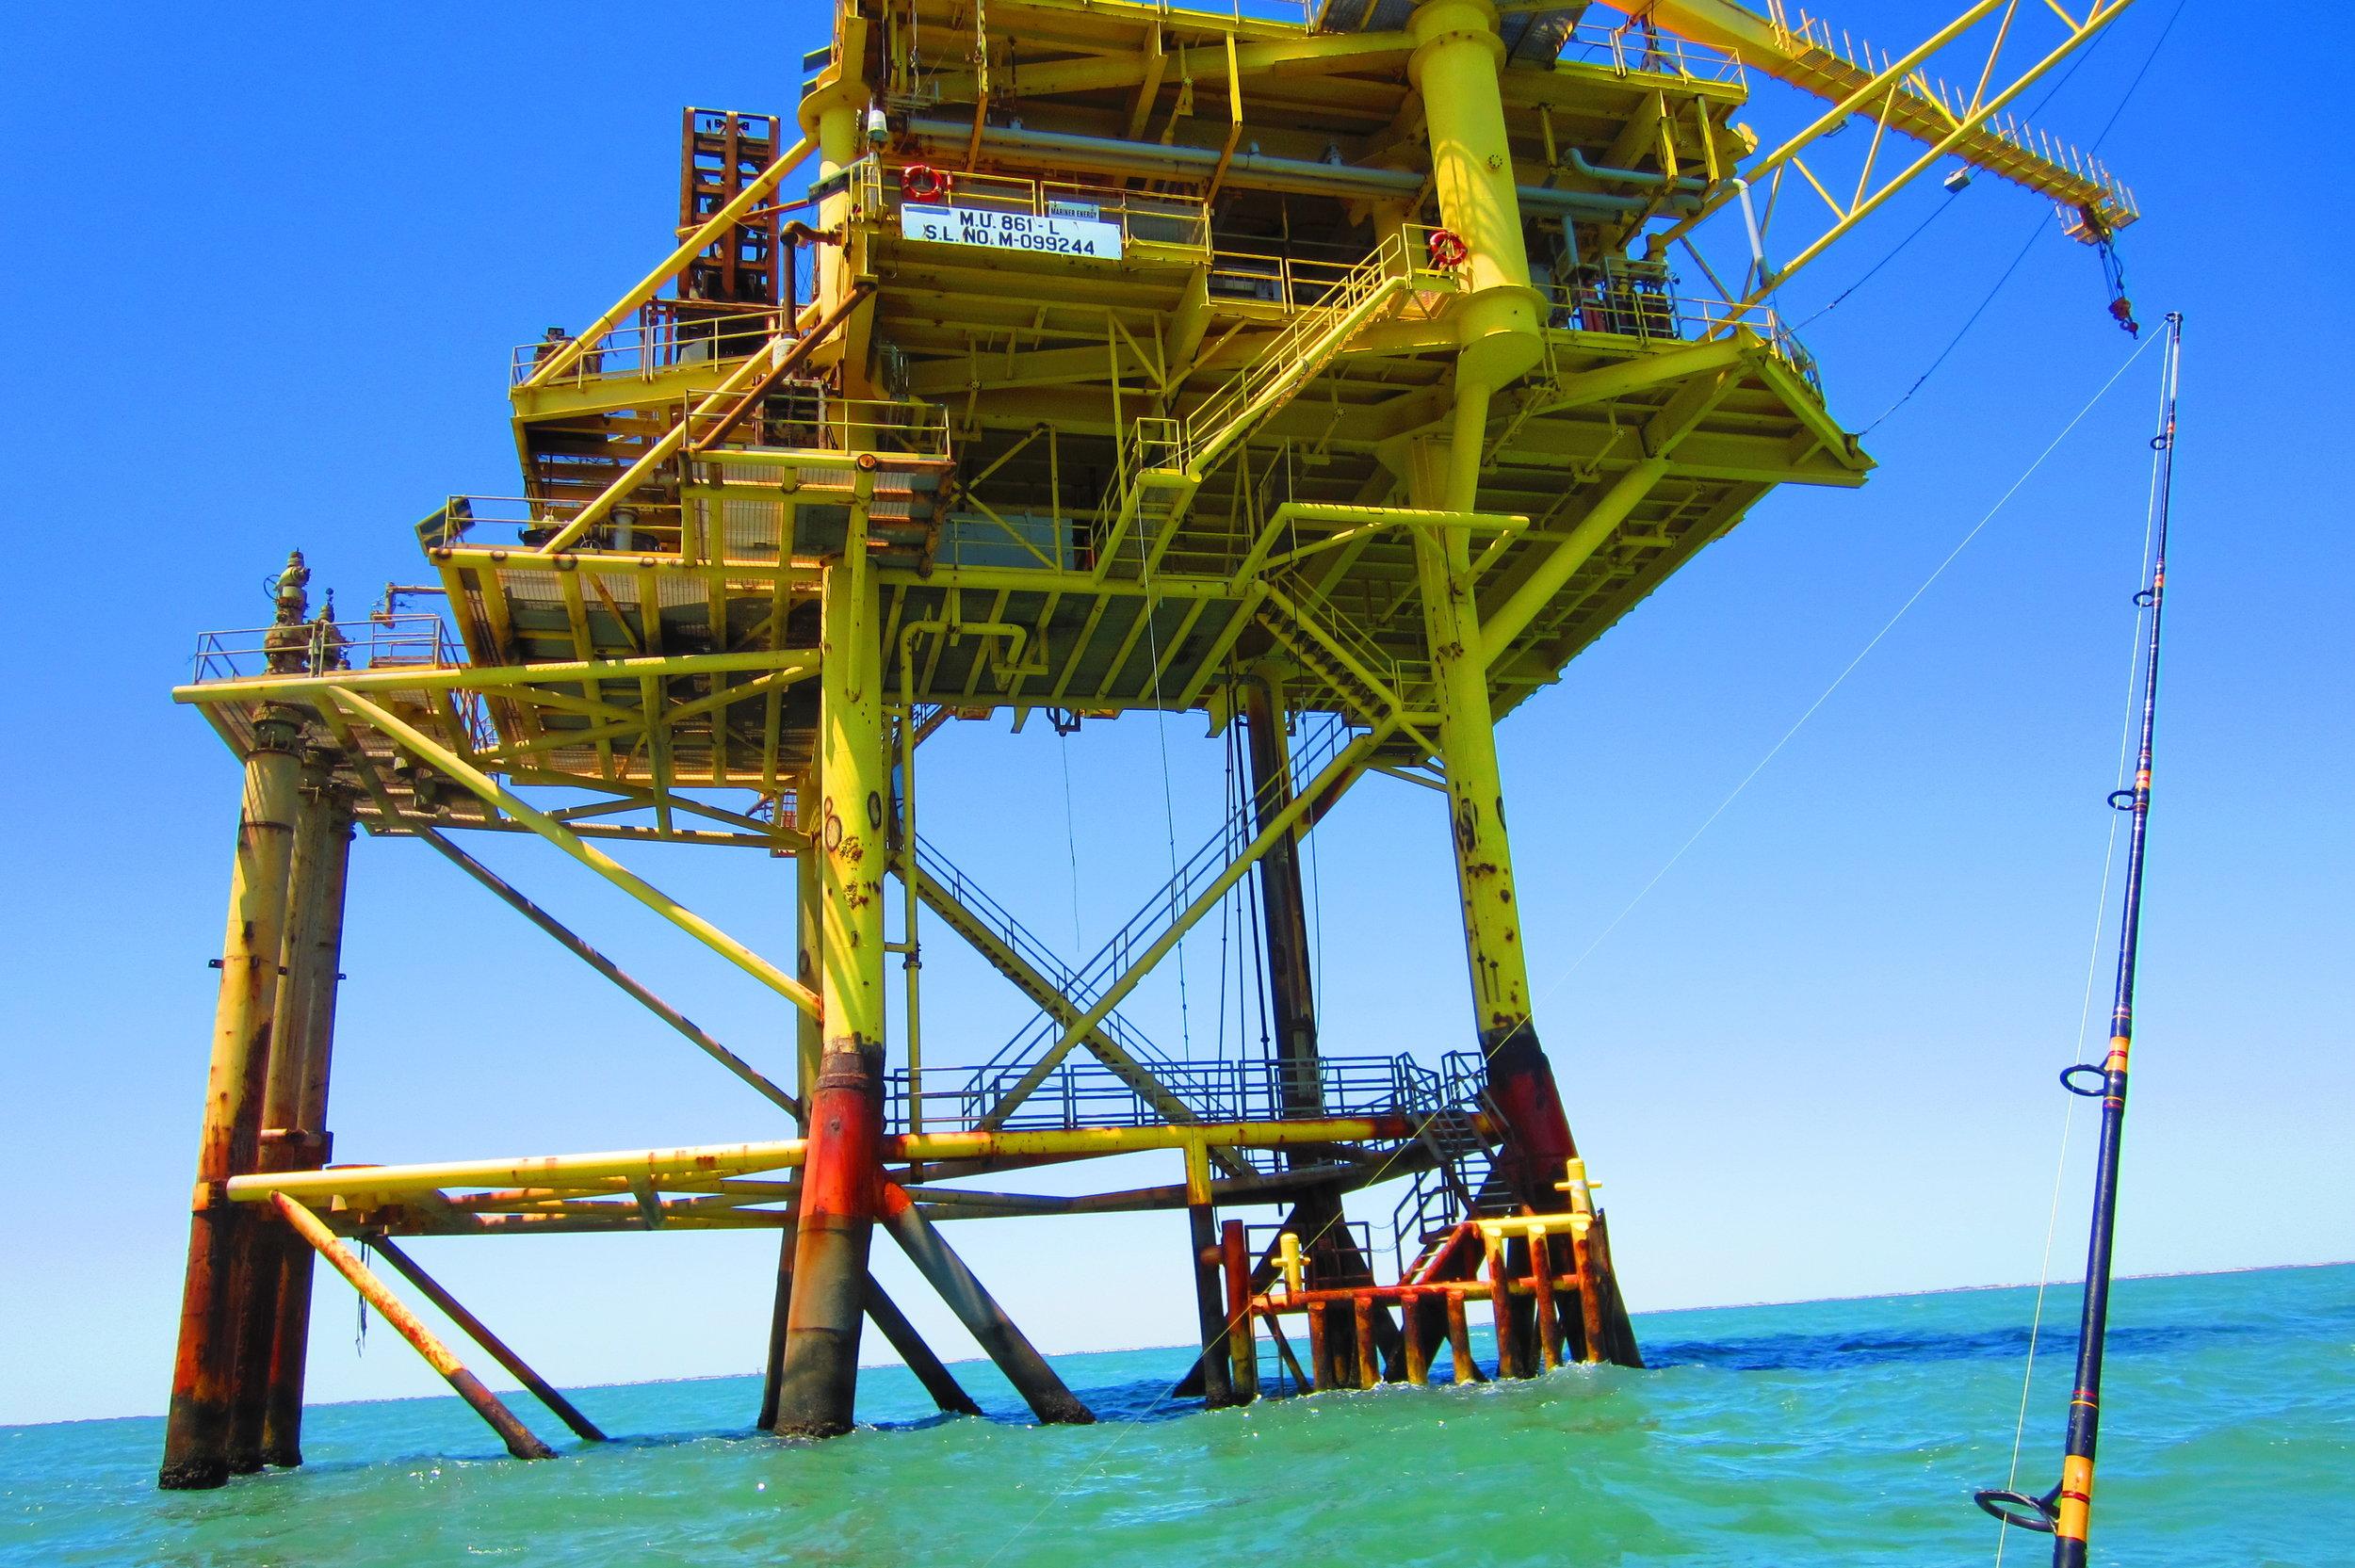 Offshore platform fishing